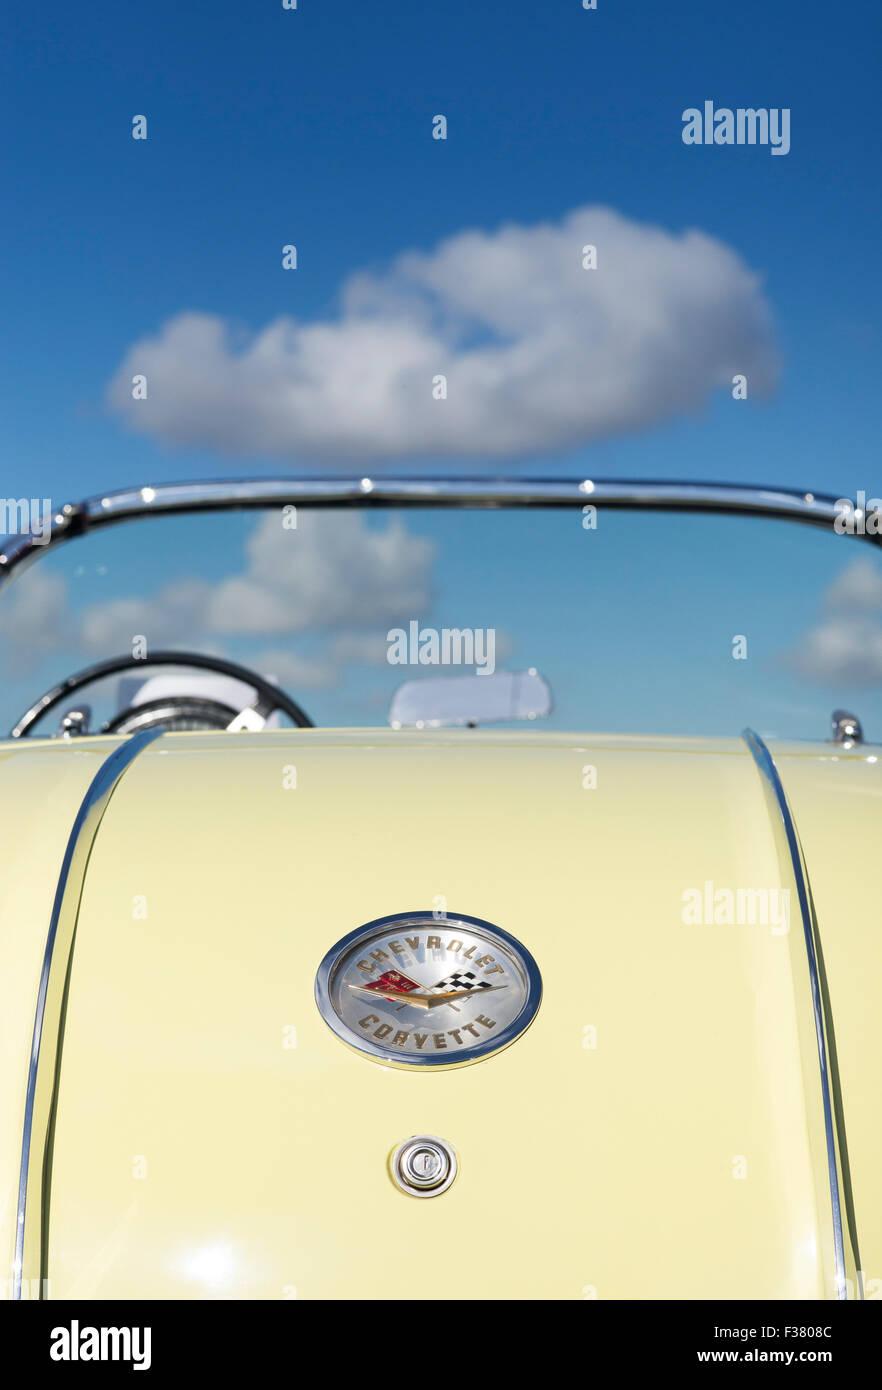 1958 Chevrolet Corvette. Classic American car rear against blue cloudy sky - Stock Image